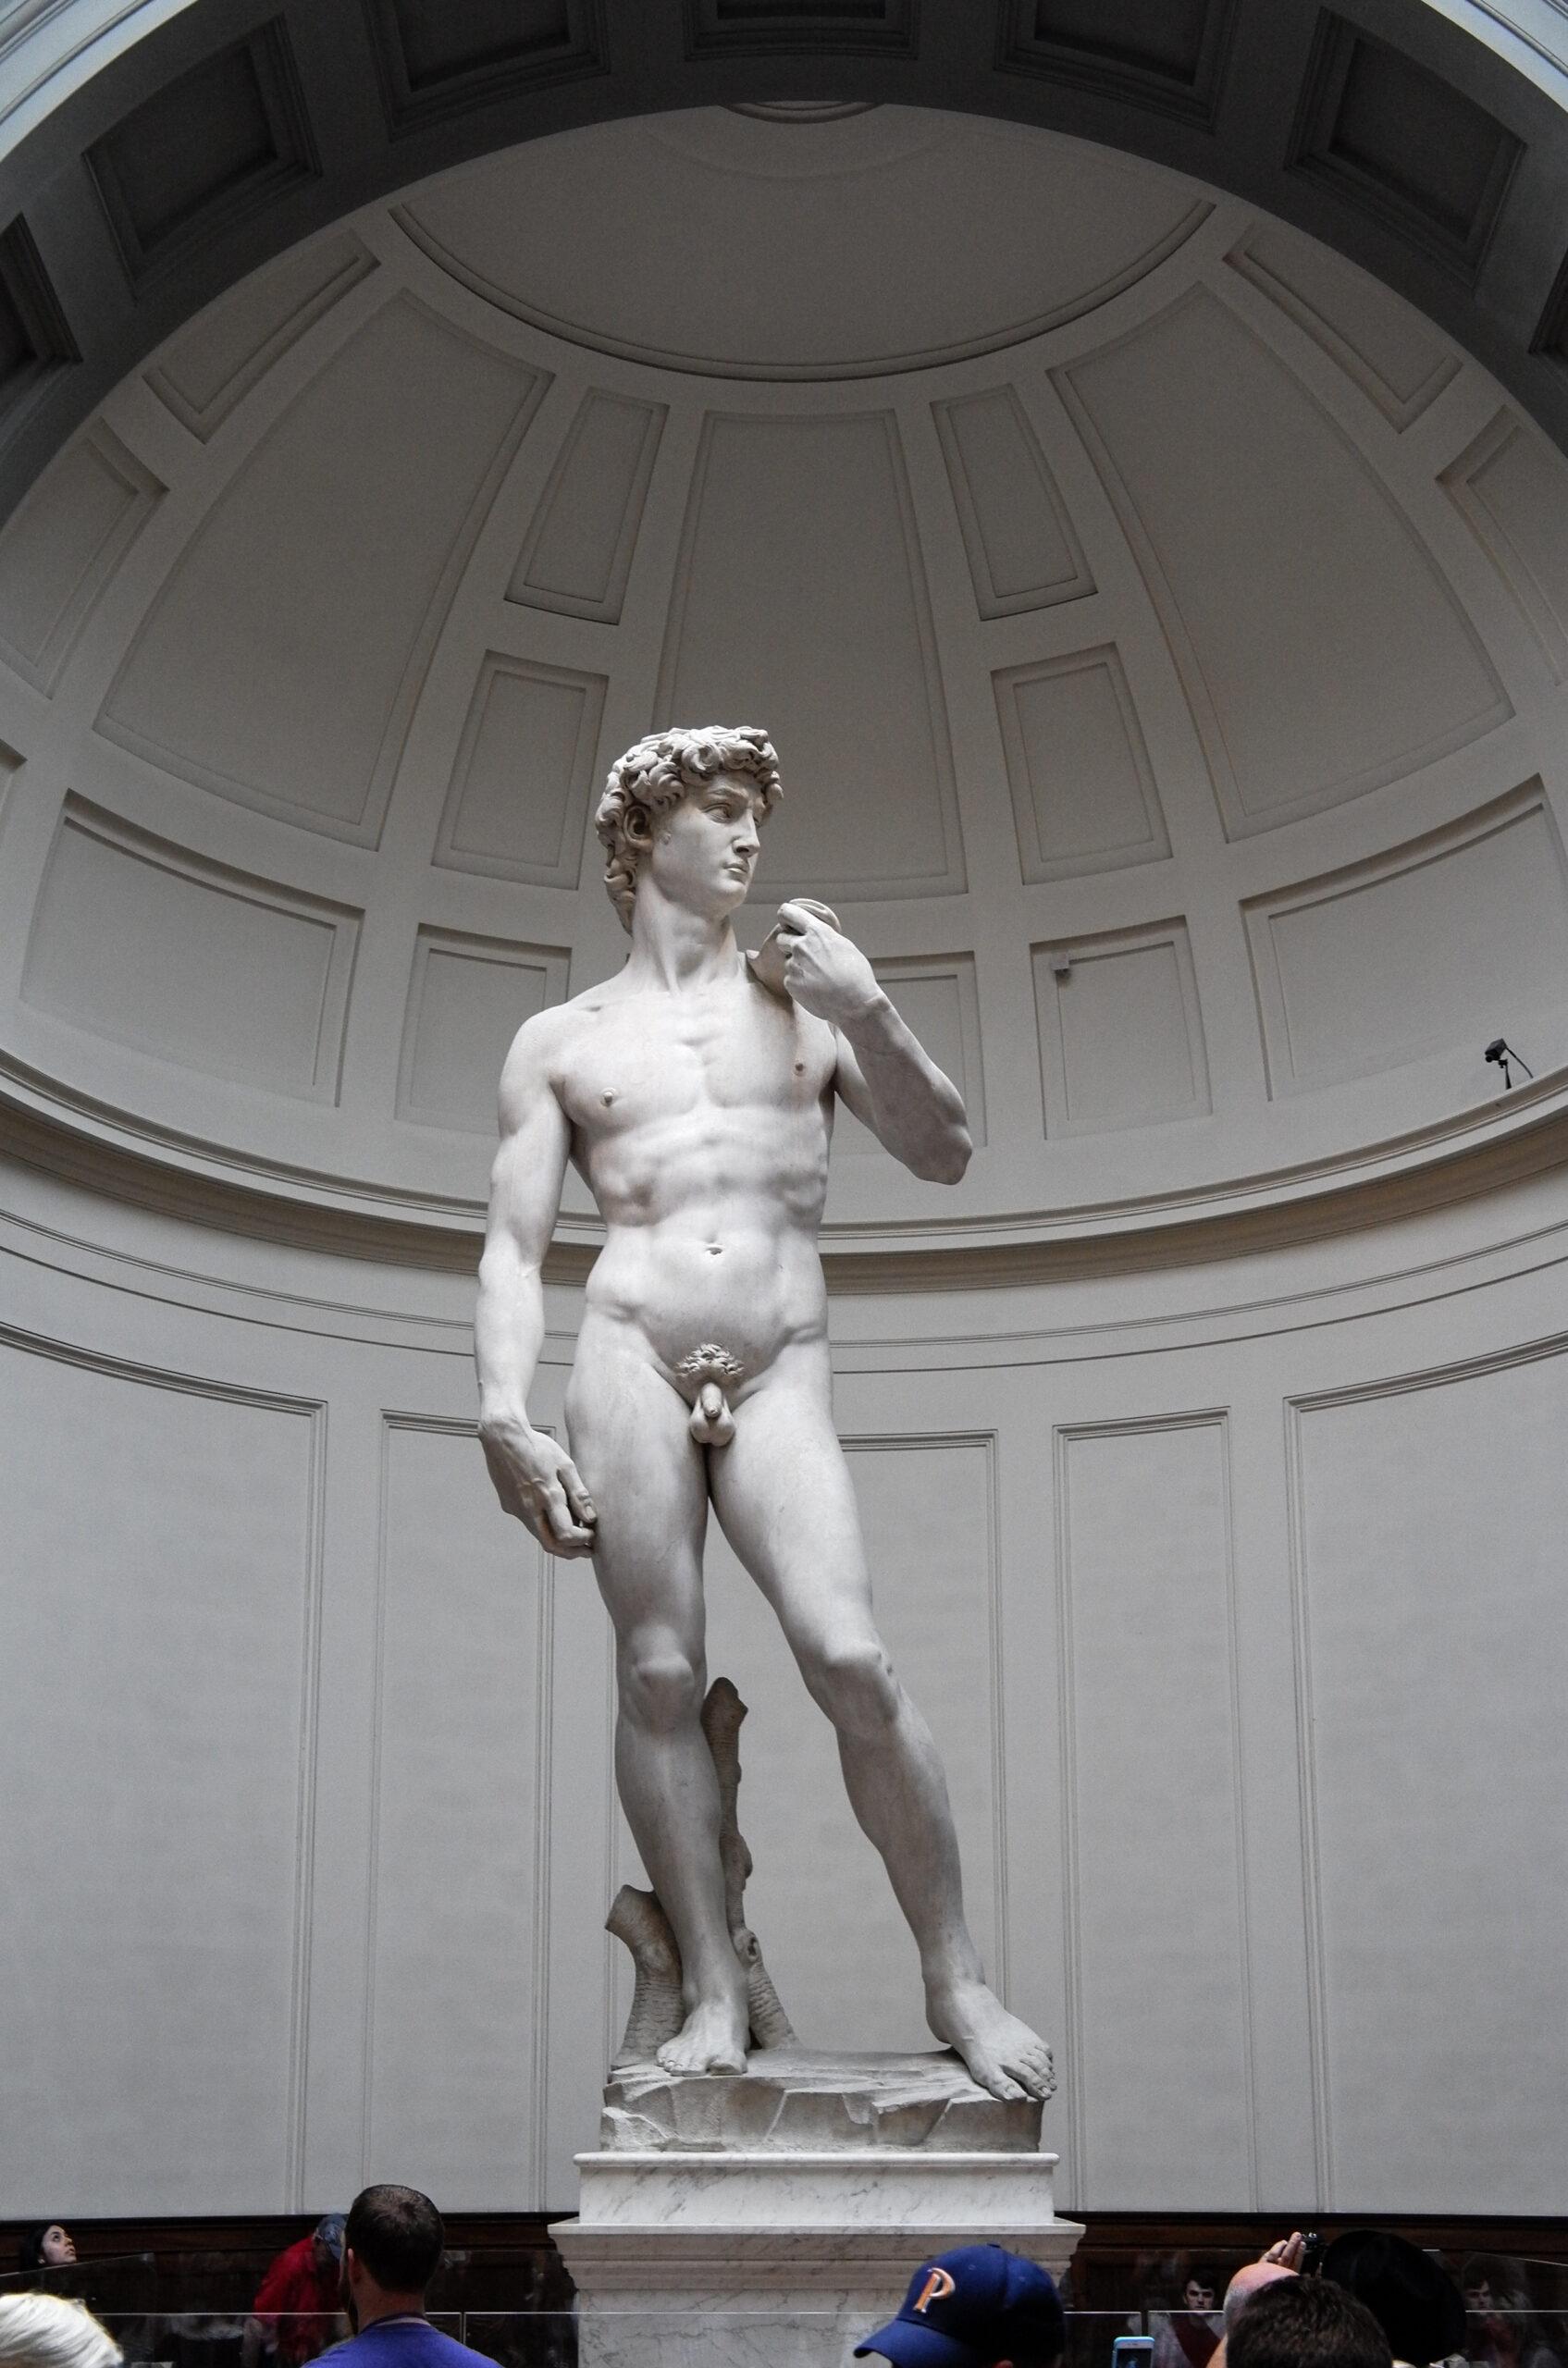 Michelangelos David berühmteste Skulptur weltweit